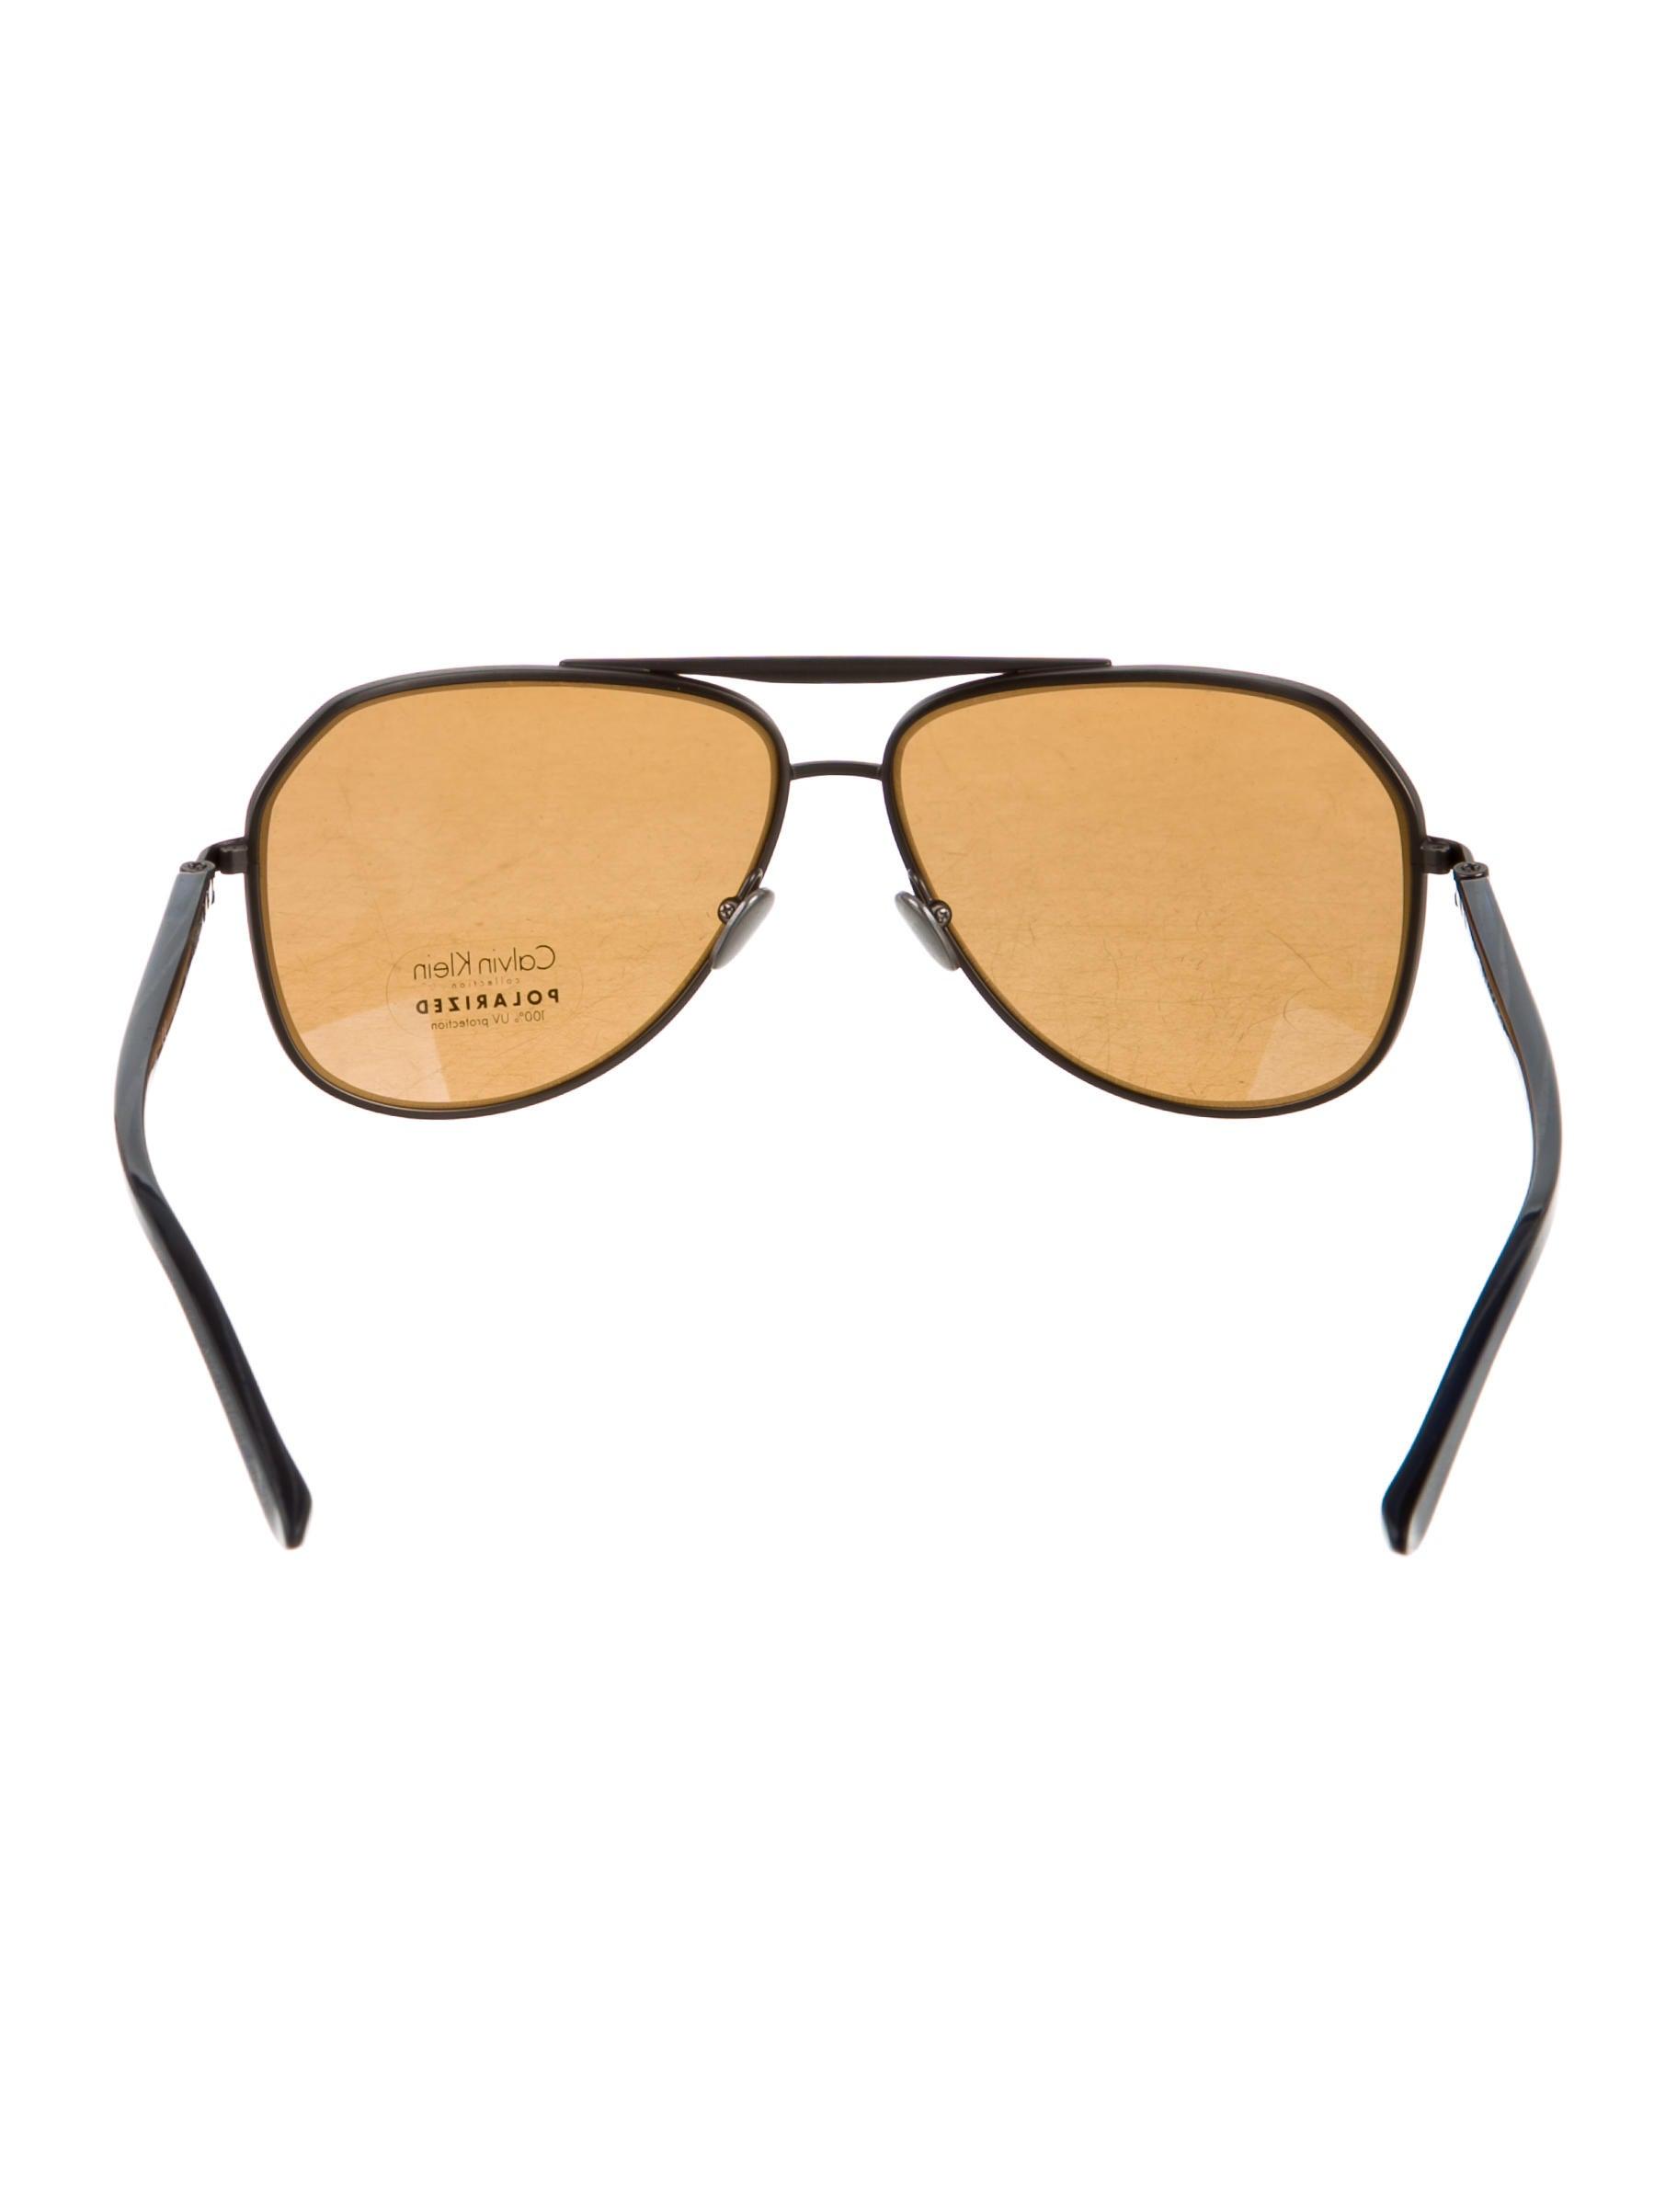 8b7aa4e4dc5 Calvin Klein Polarized Aviator Sunglasses